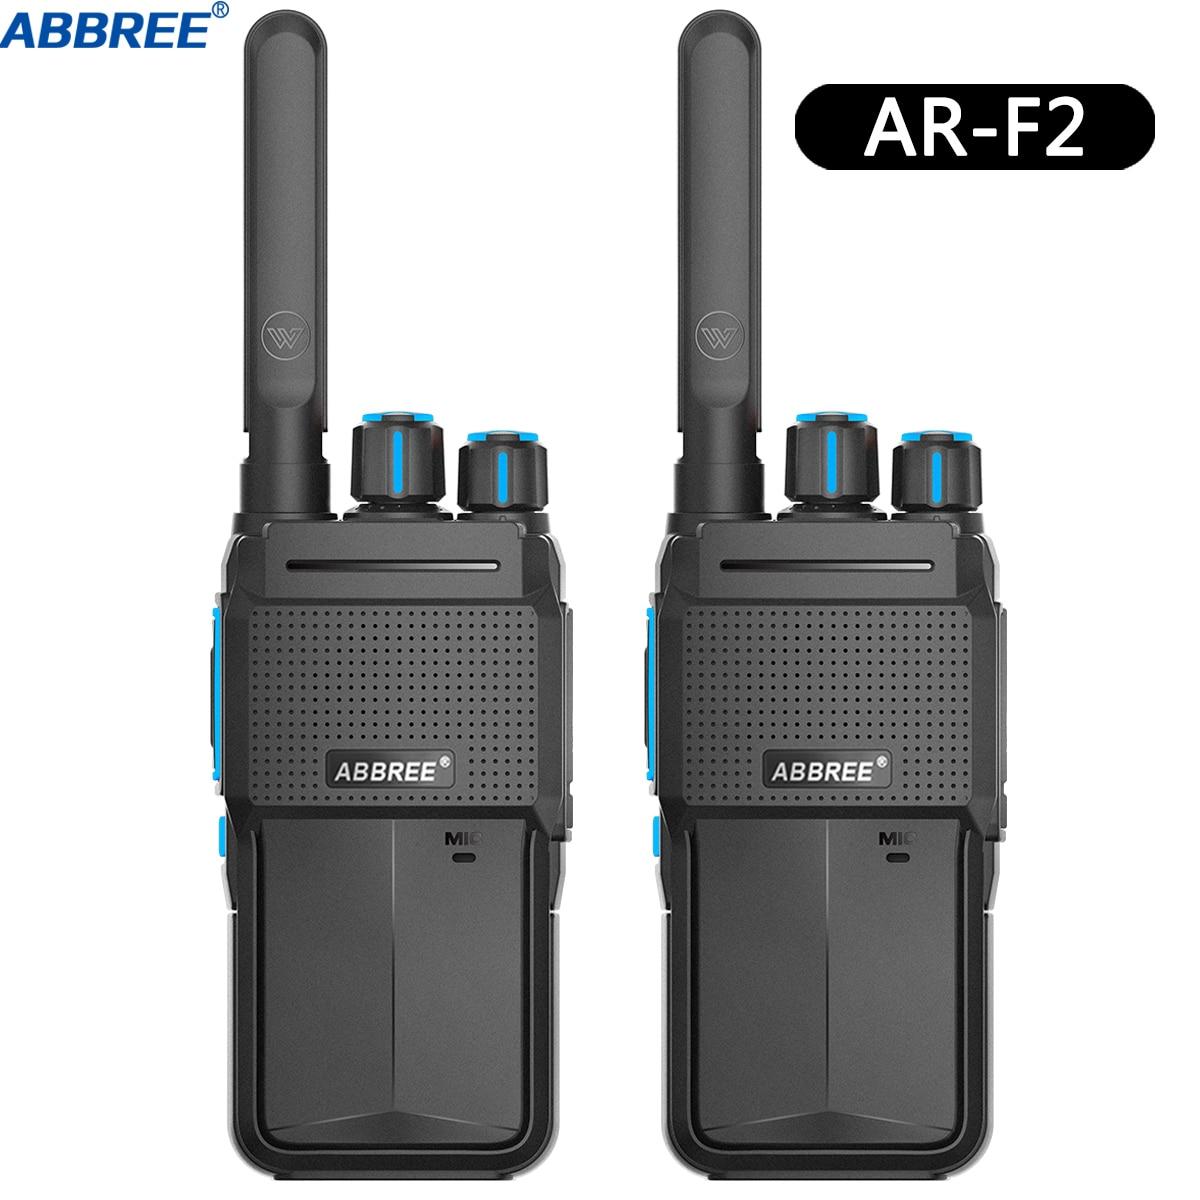 2PCS ABBREE AR-F2 Walkie Talkie CB Radio Transceiver 5W 10km Lange Palette Tragbare für Jagd Wald Stadt upgrade Baofeng BF-888S